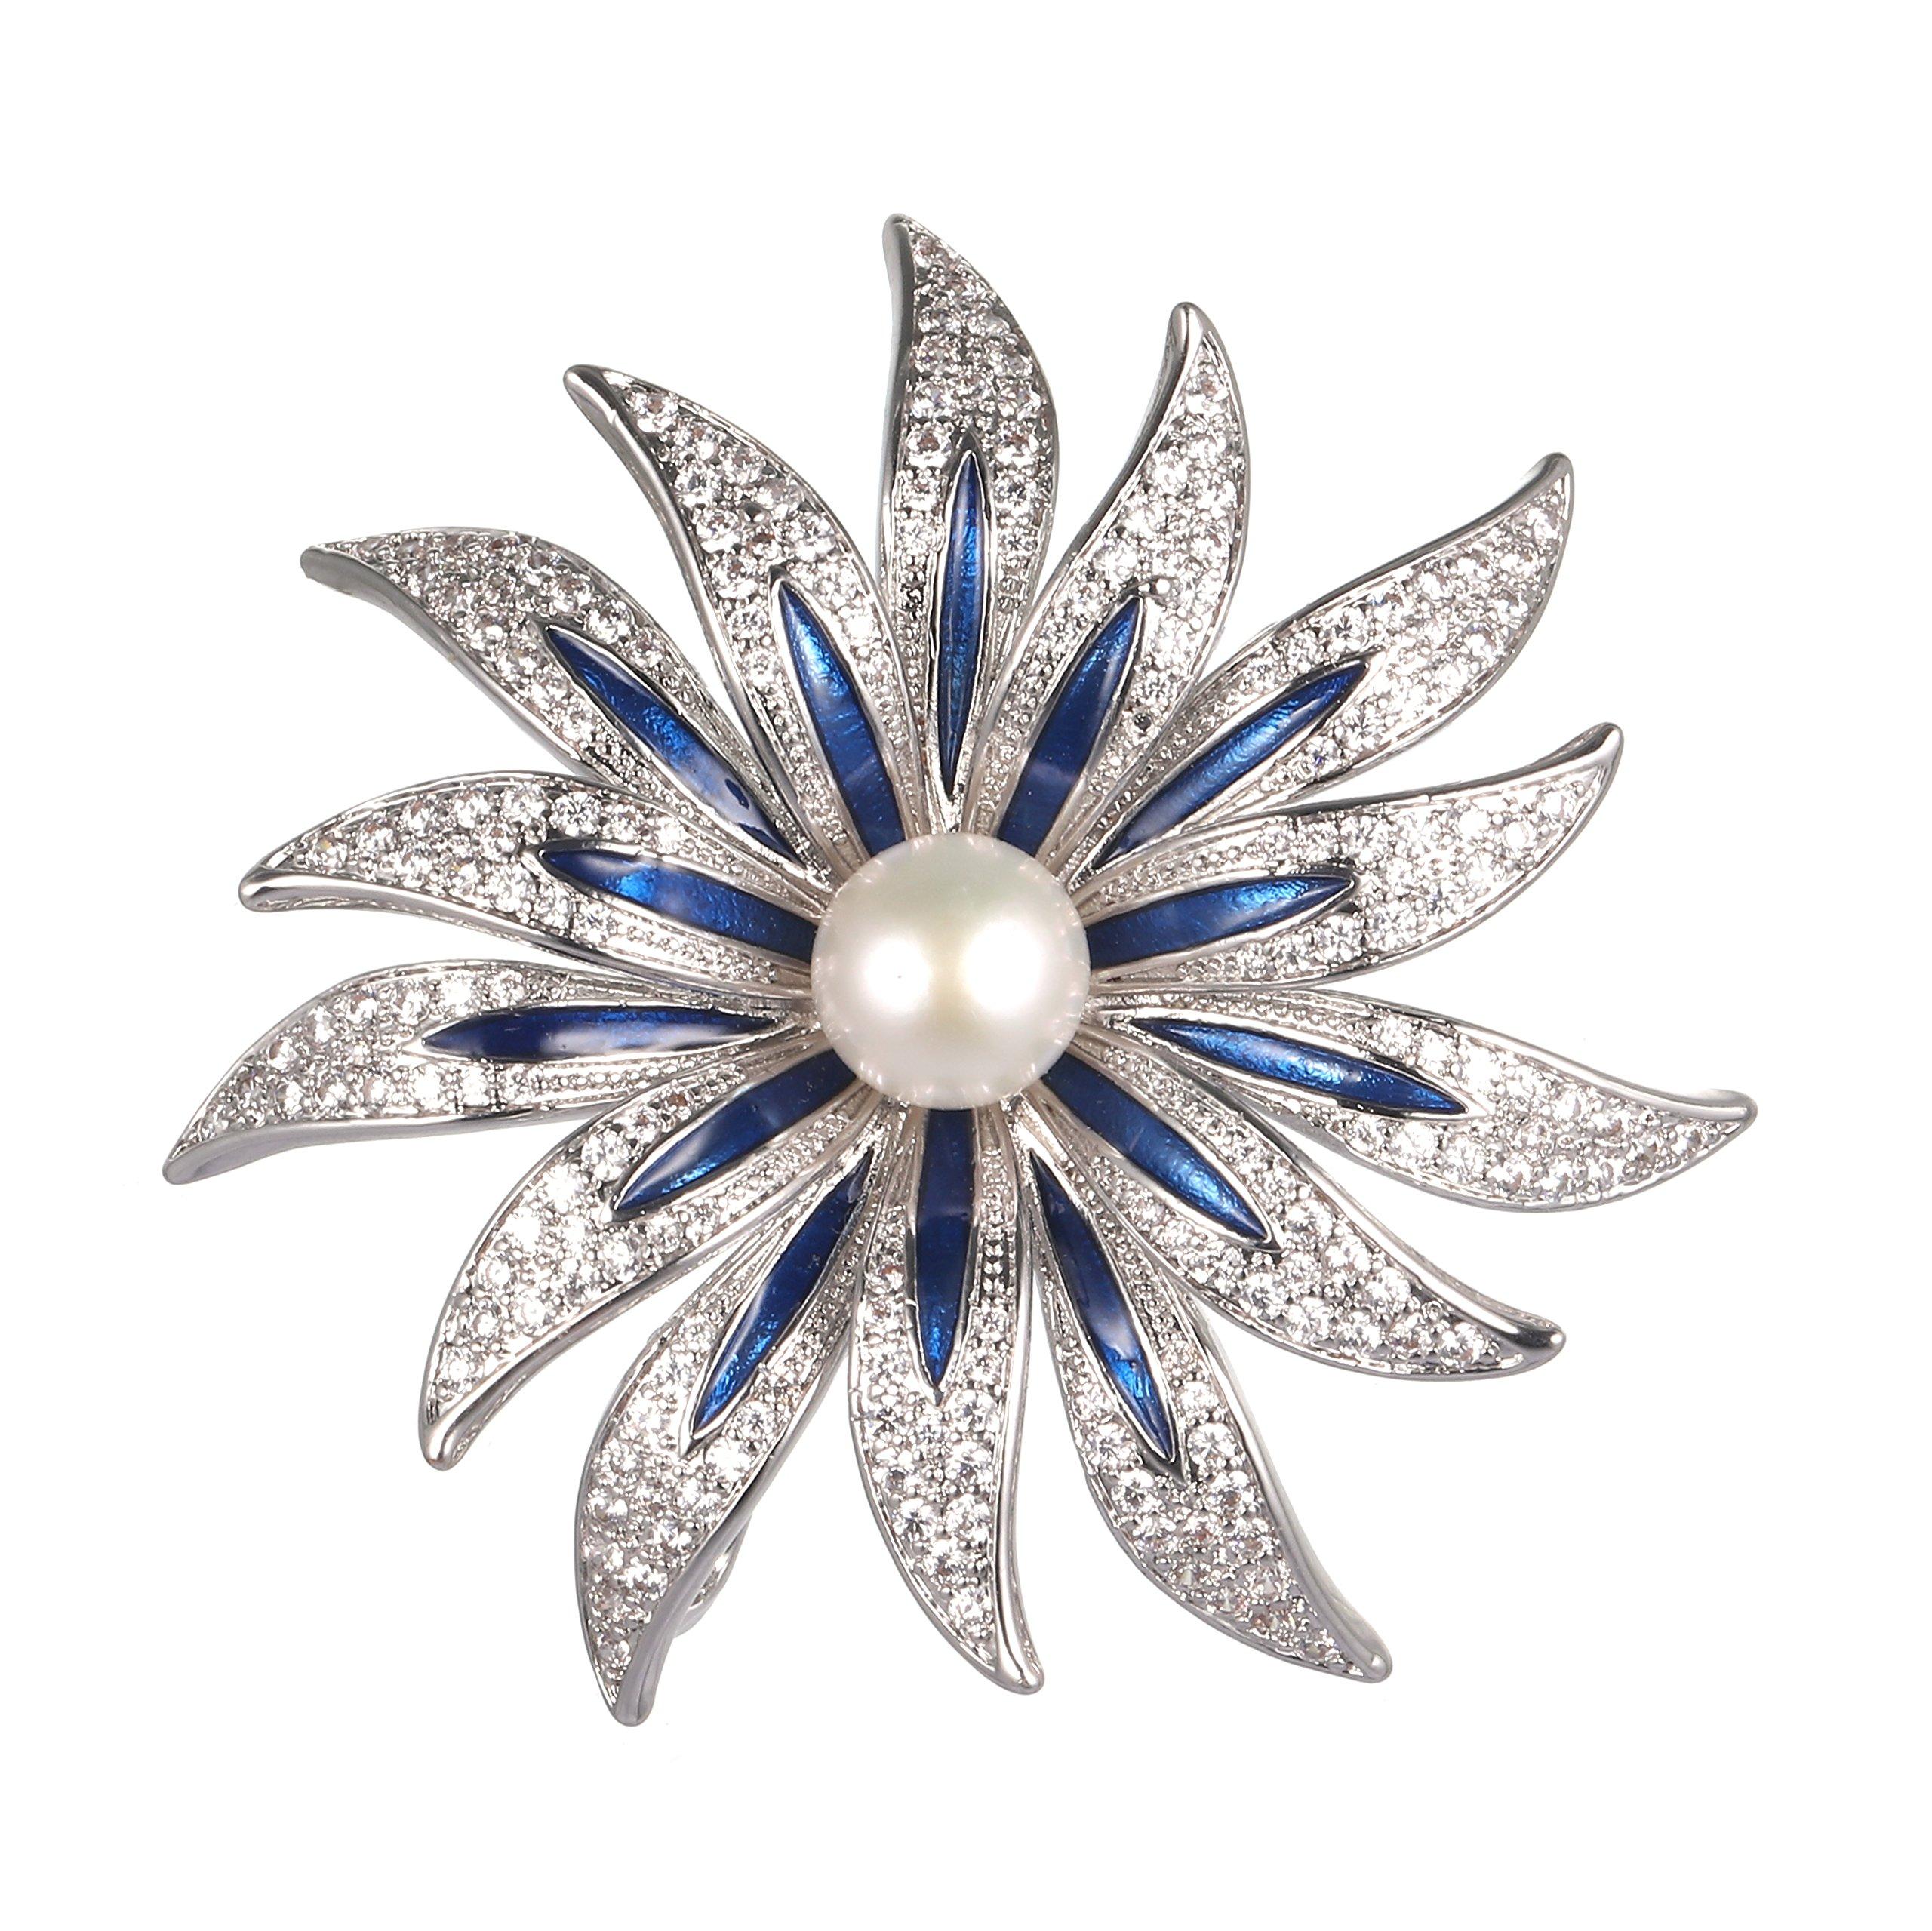 WenQian Jewelry Halloween Brooch,Christmas Brooch,AAAA 9mm More petal flowers Pearl Brooch